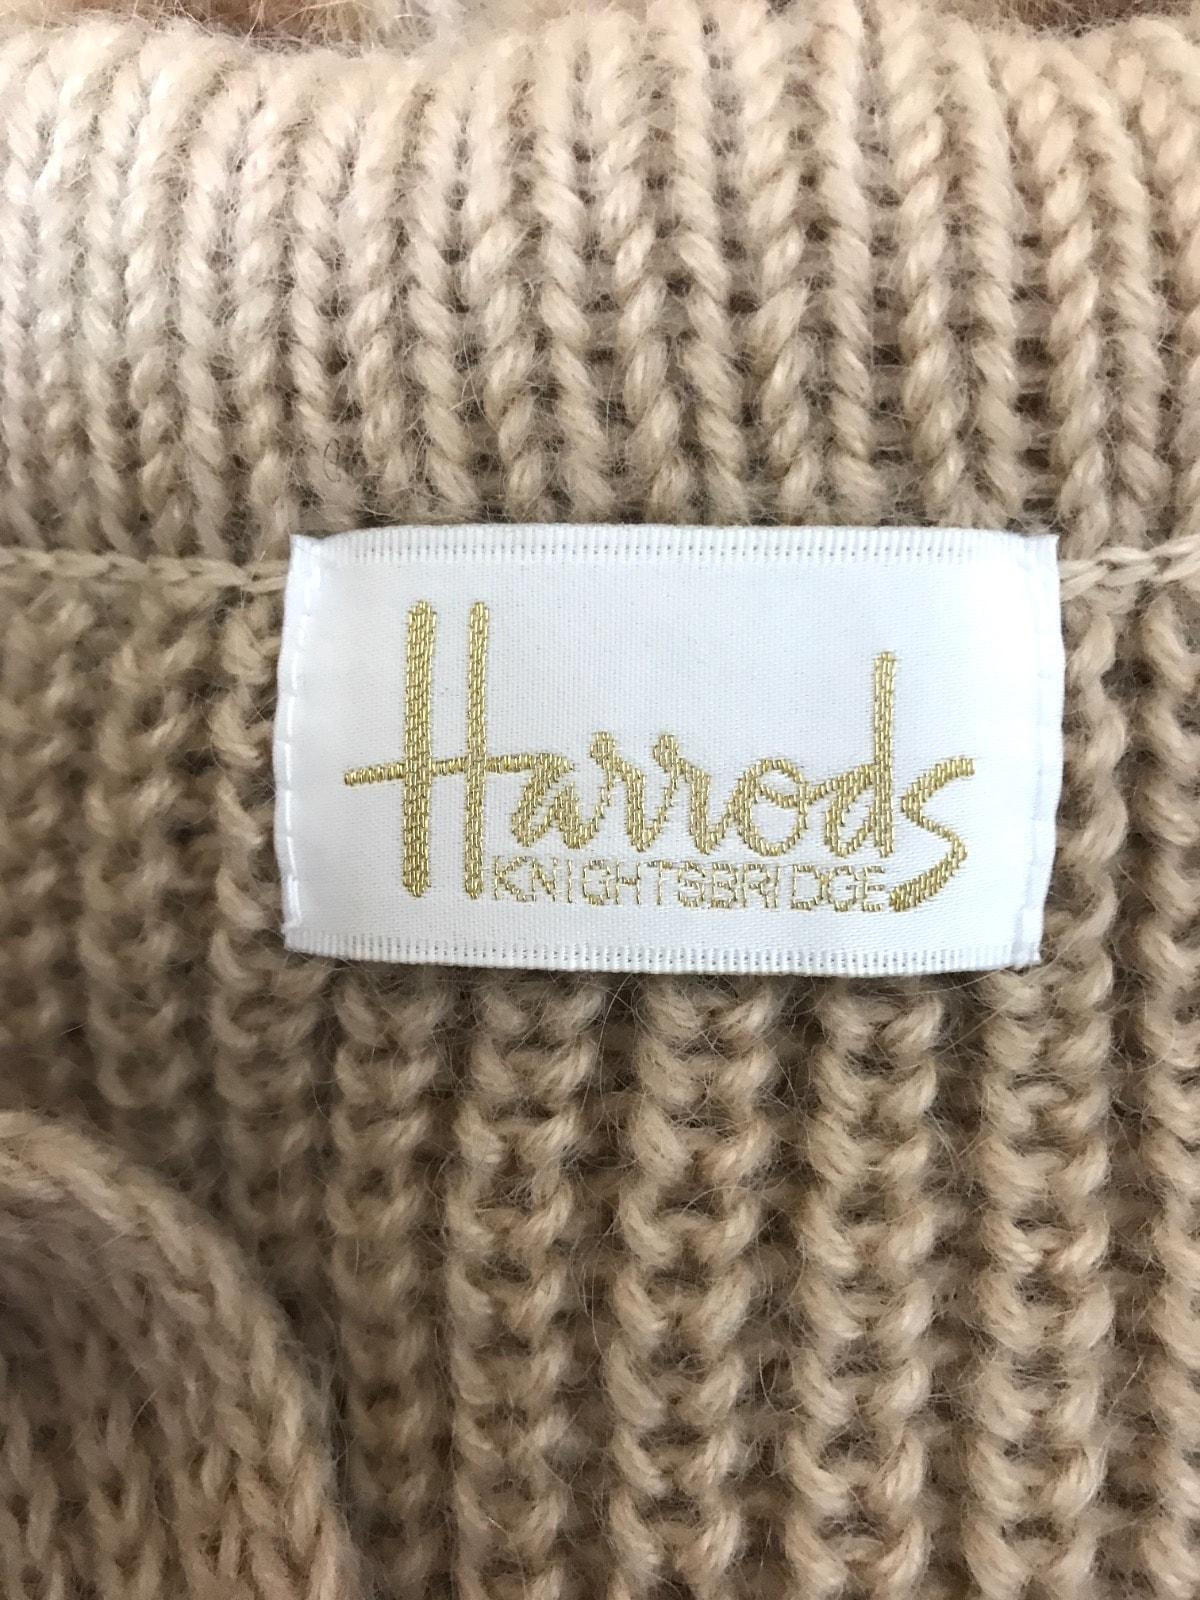 HARRODS(ハロッズ)のカーディガン